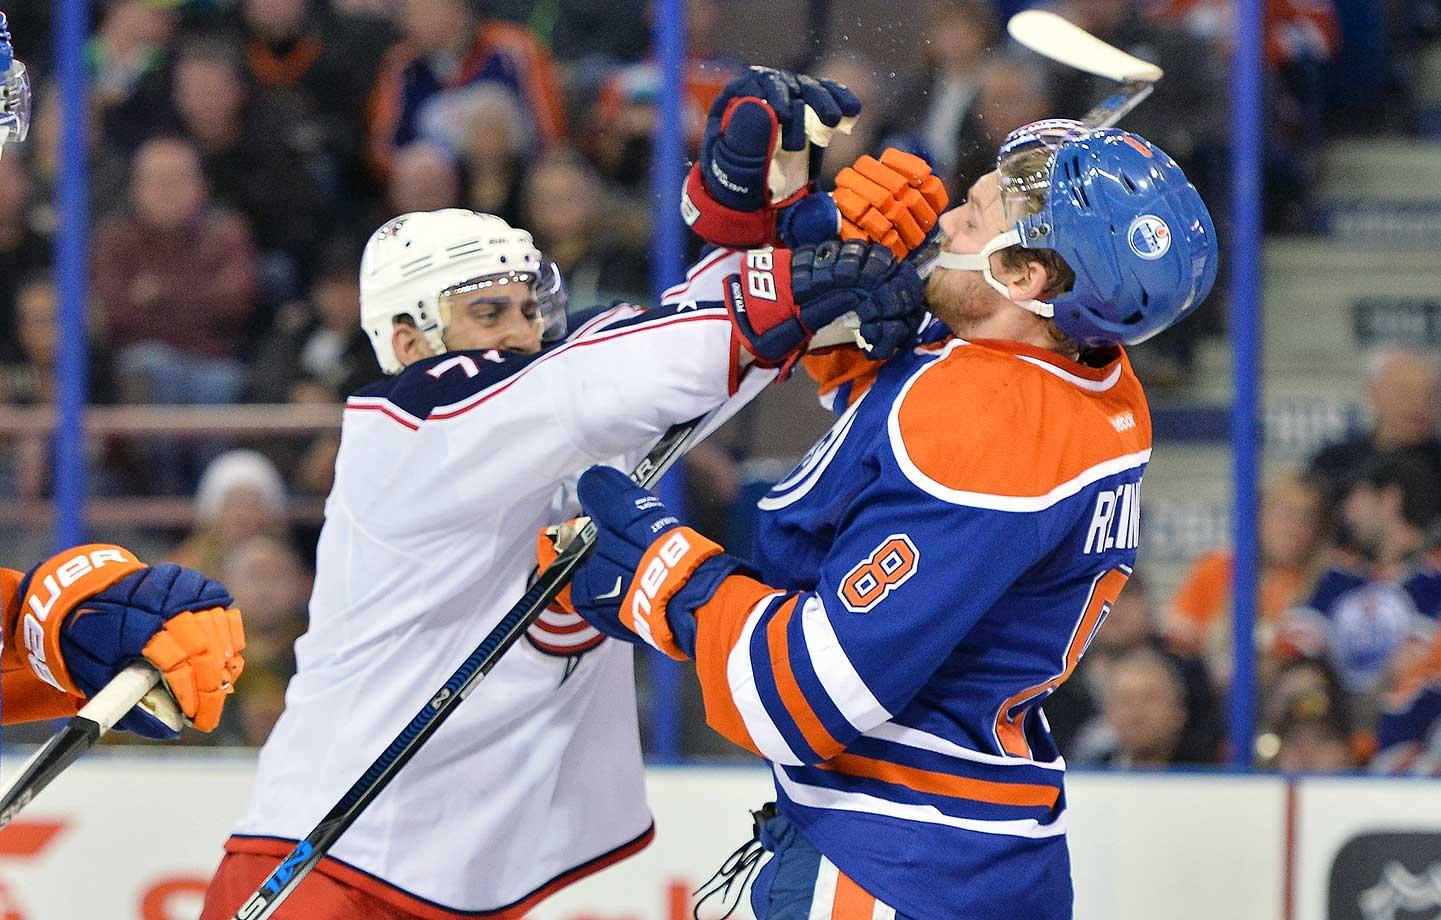 Columbus Blue Jackets winger Nick Foligno punches Edmonton Oilers defenseman Griffin Reinhart at Rexall Place in Edmonton, Alberta, Canada.